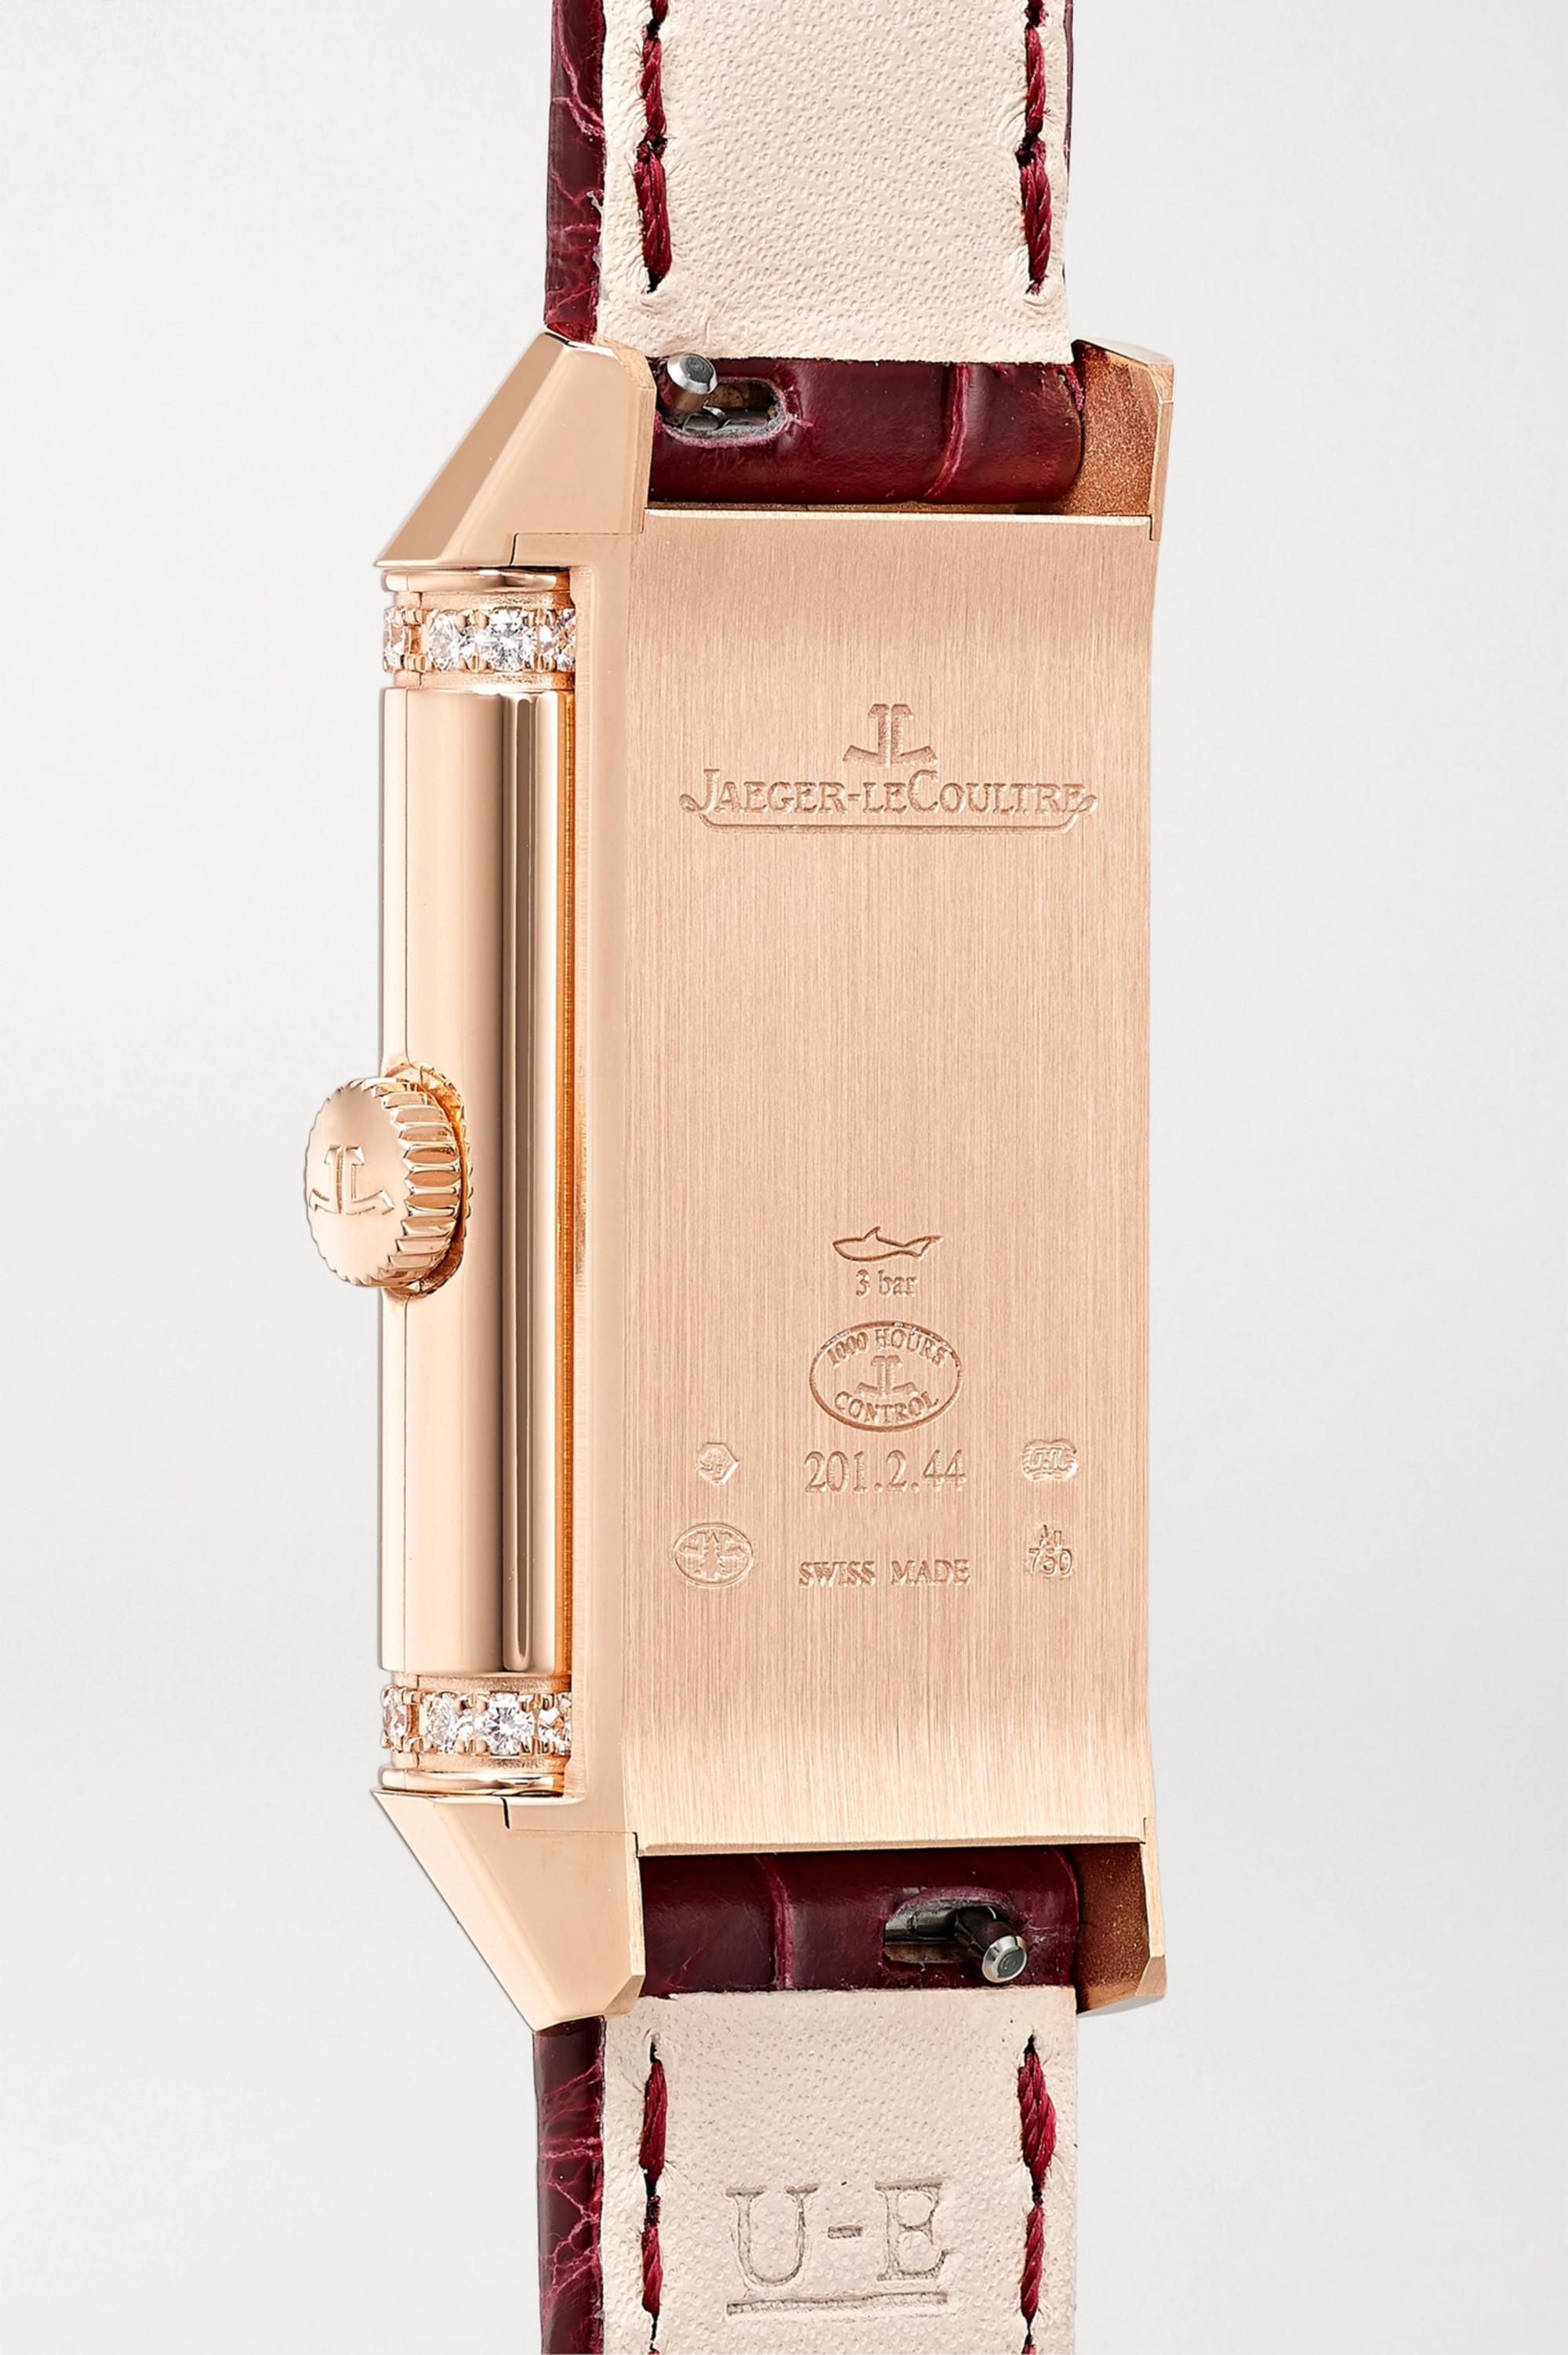 Jaeger-LeCoultre Reverso One Duetto 20 mm Uhr aus Roségold mit Diamanten und Alligatorlederarmband